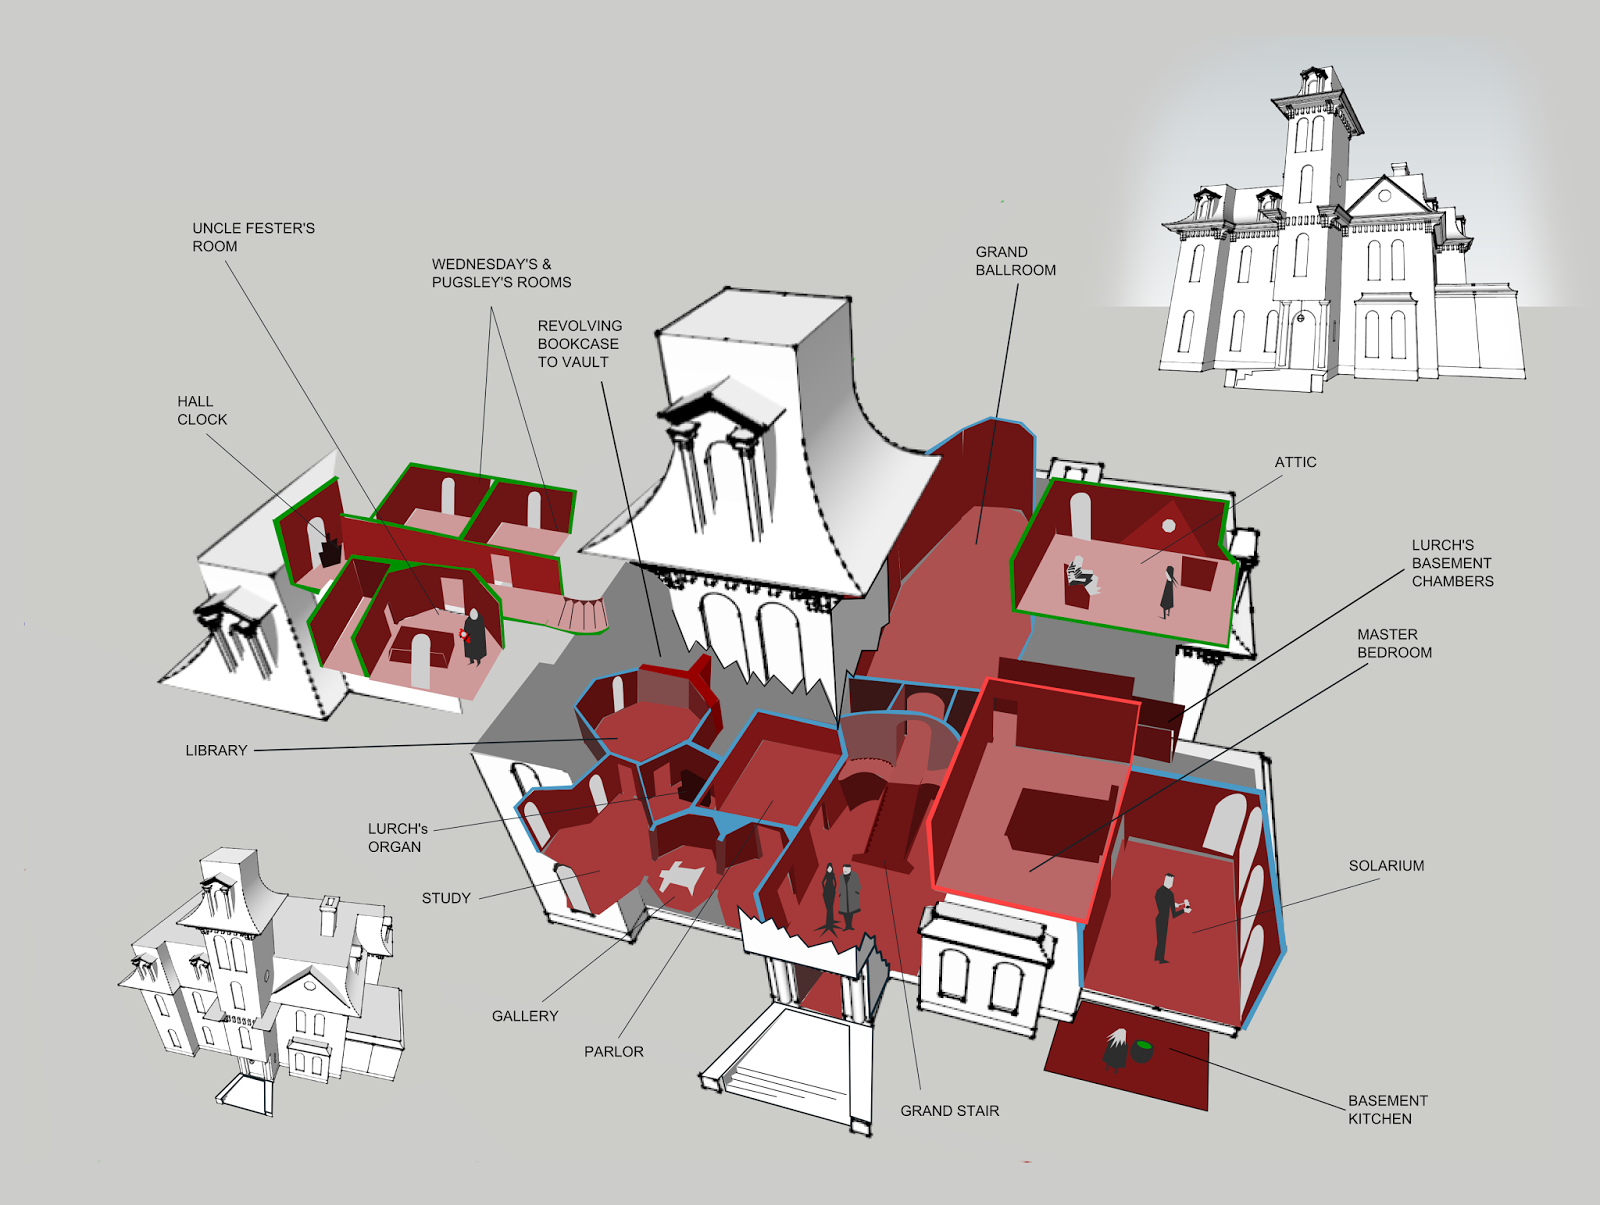 Stinson Lenz Freelance Design Wip The Addams Family Mansion 1991